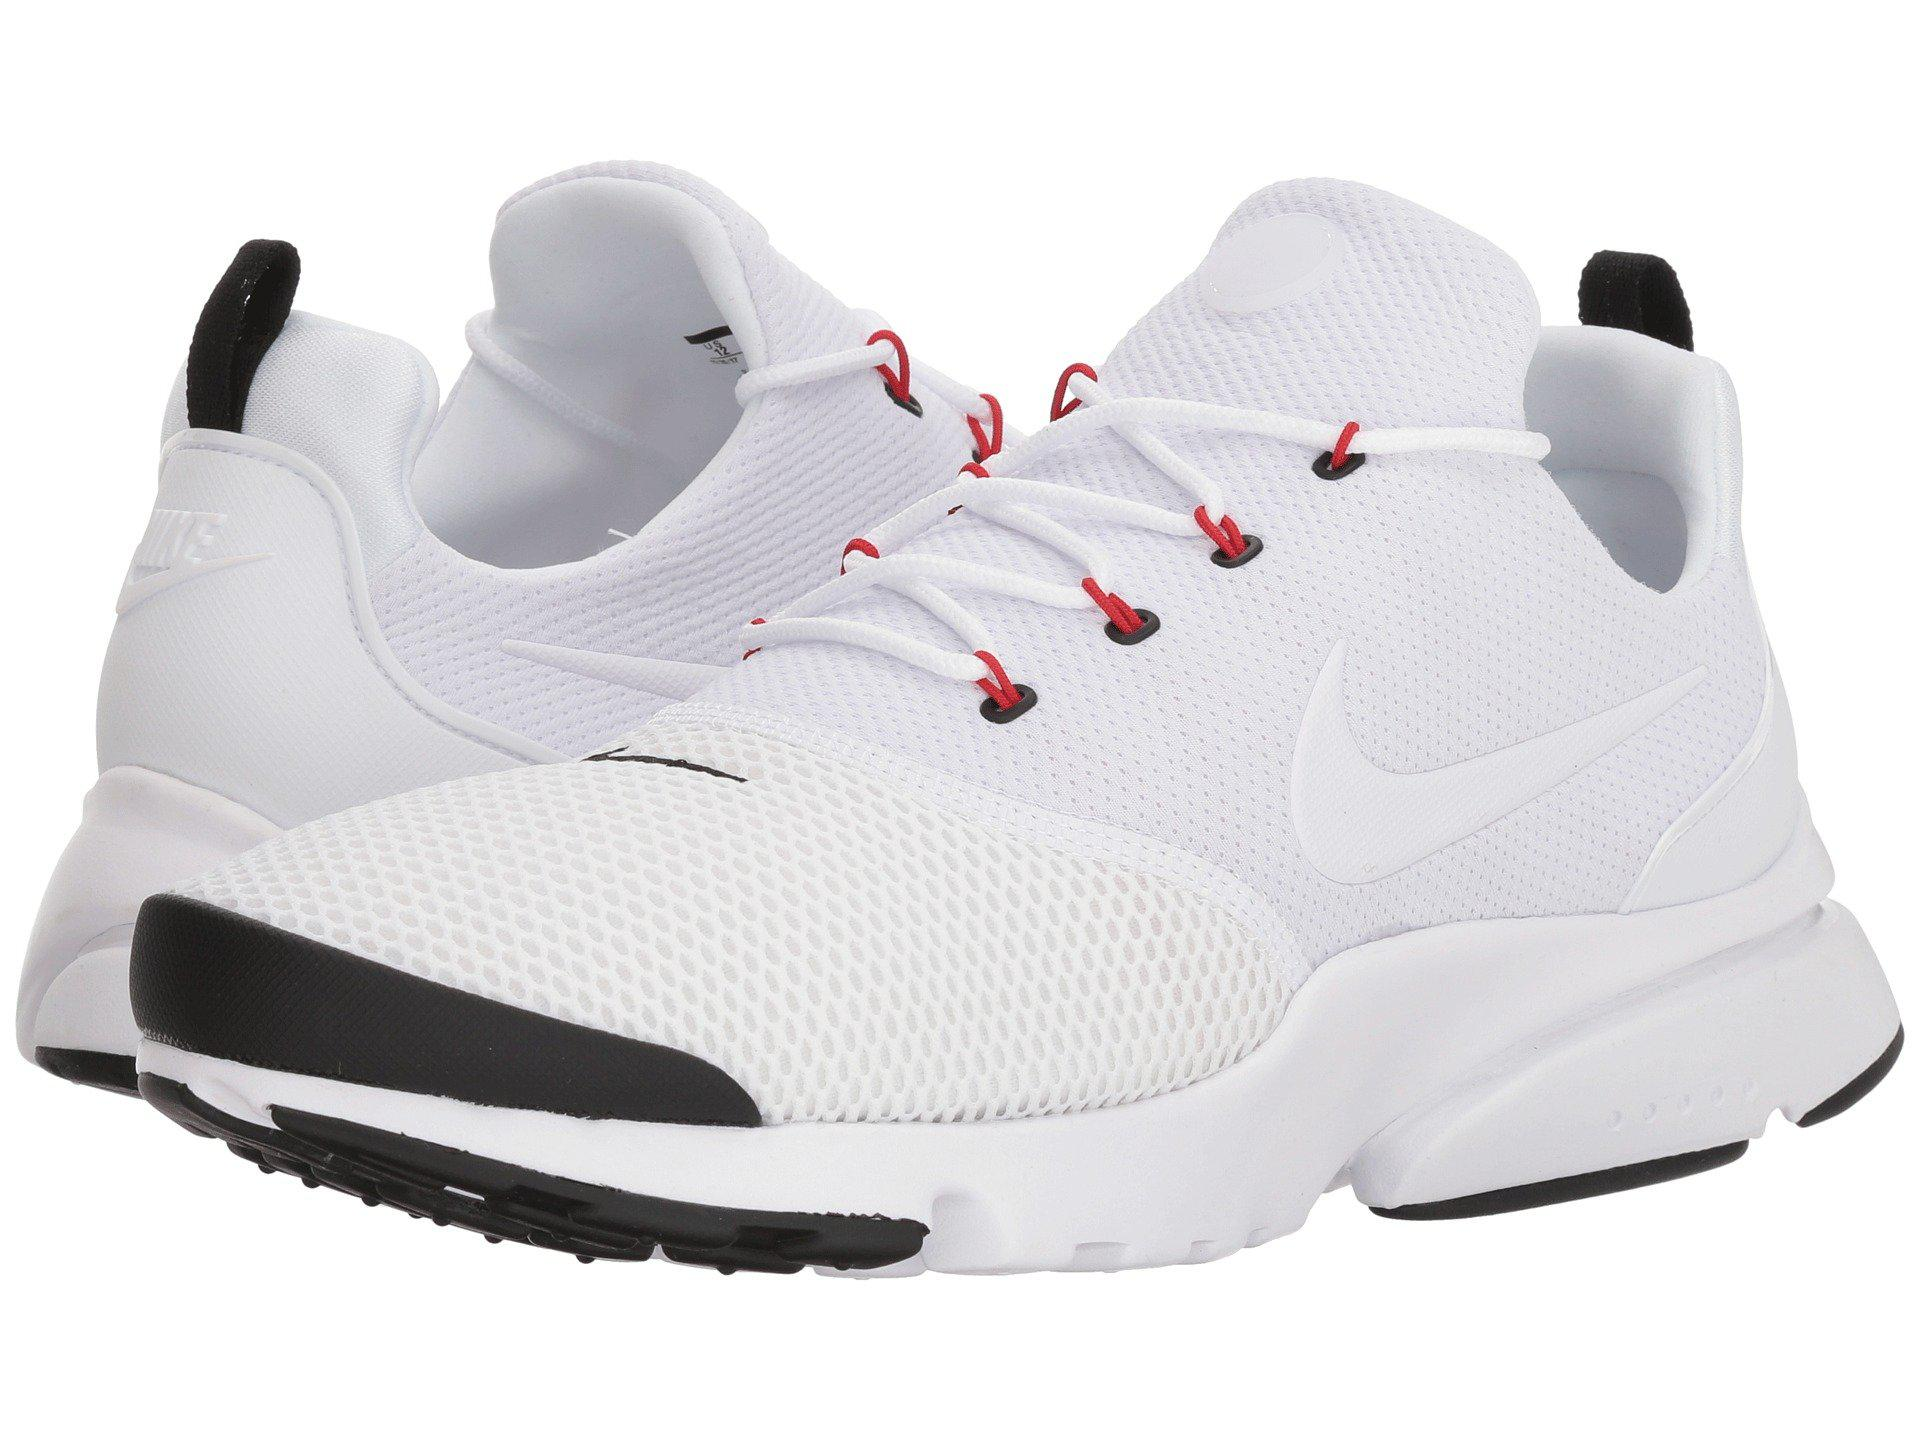 fd606e9b3c44 Lyst - Nike Presto Fly in White for Men - Save 13%